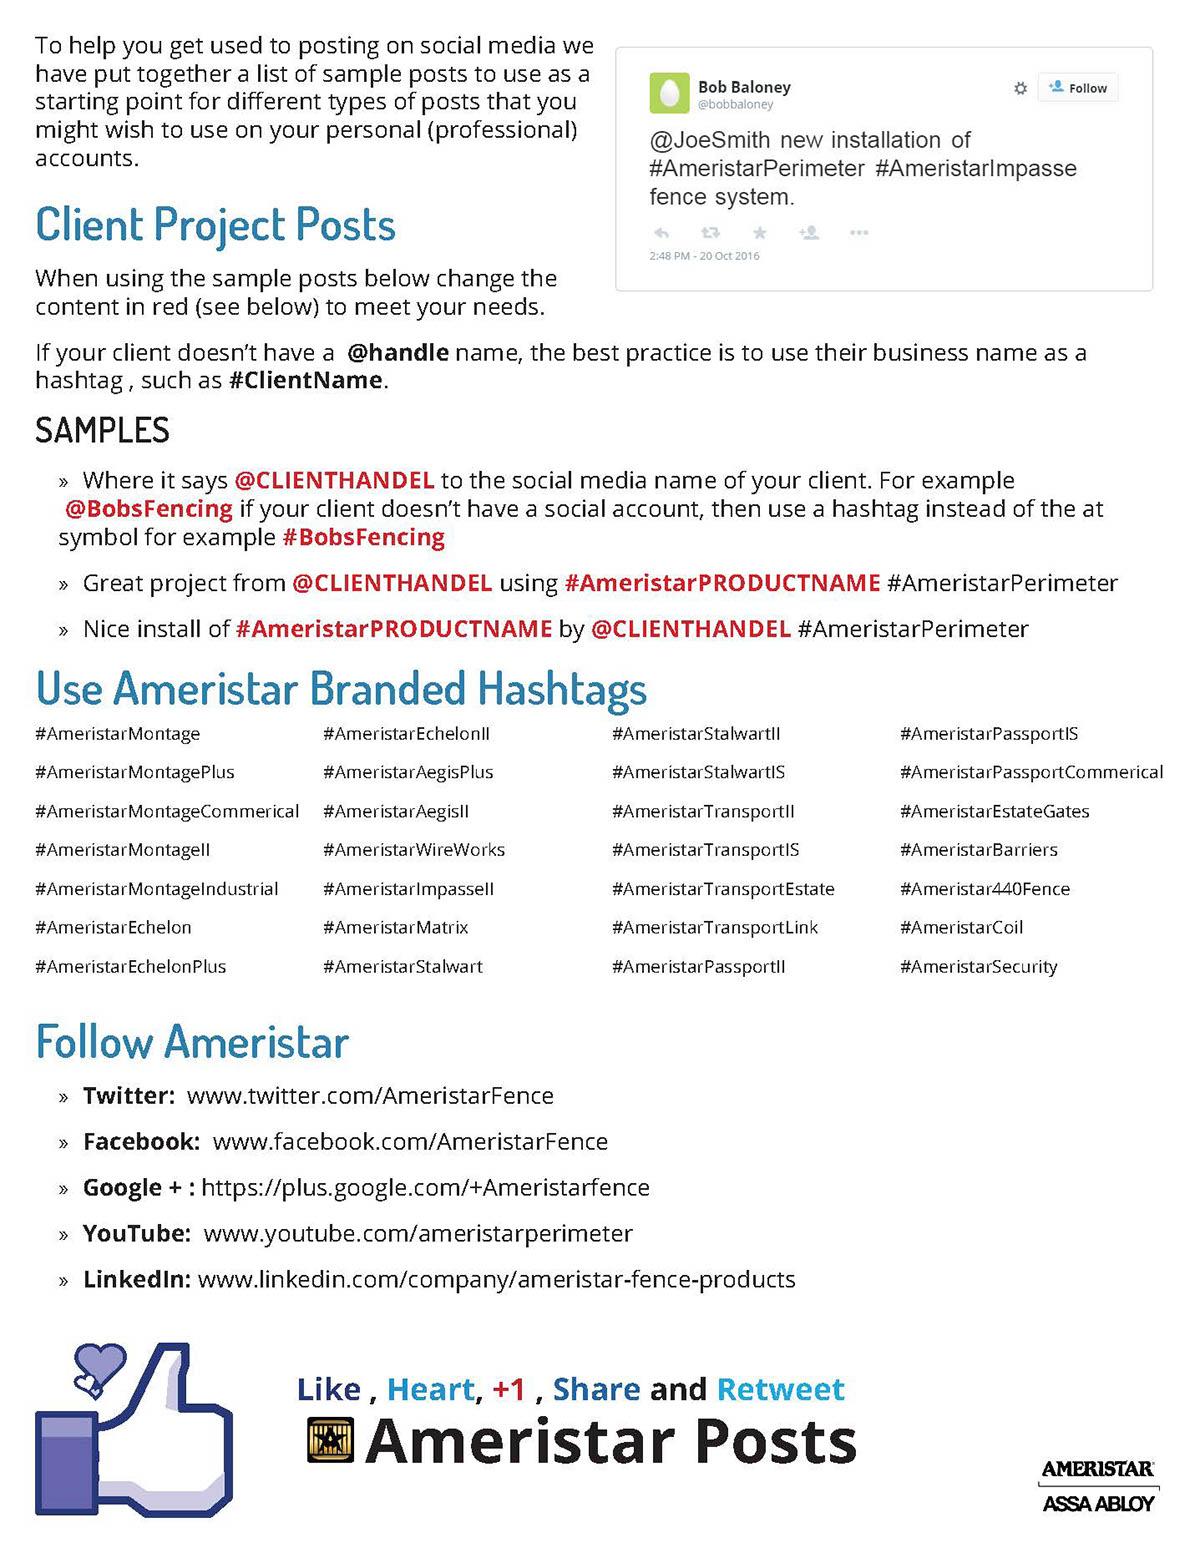 Ameristar Social Media Guidelines Booklet on Behance